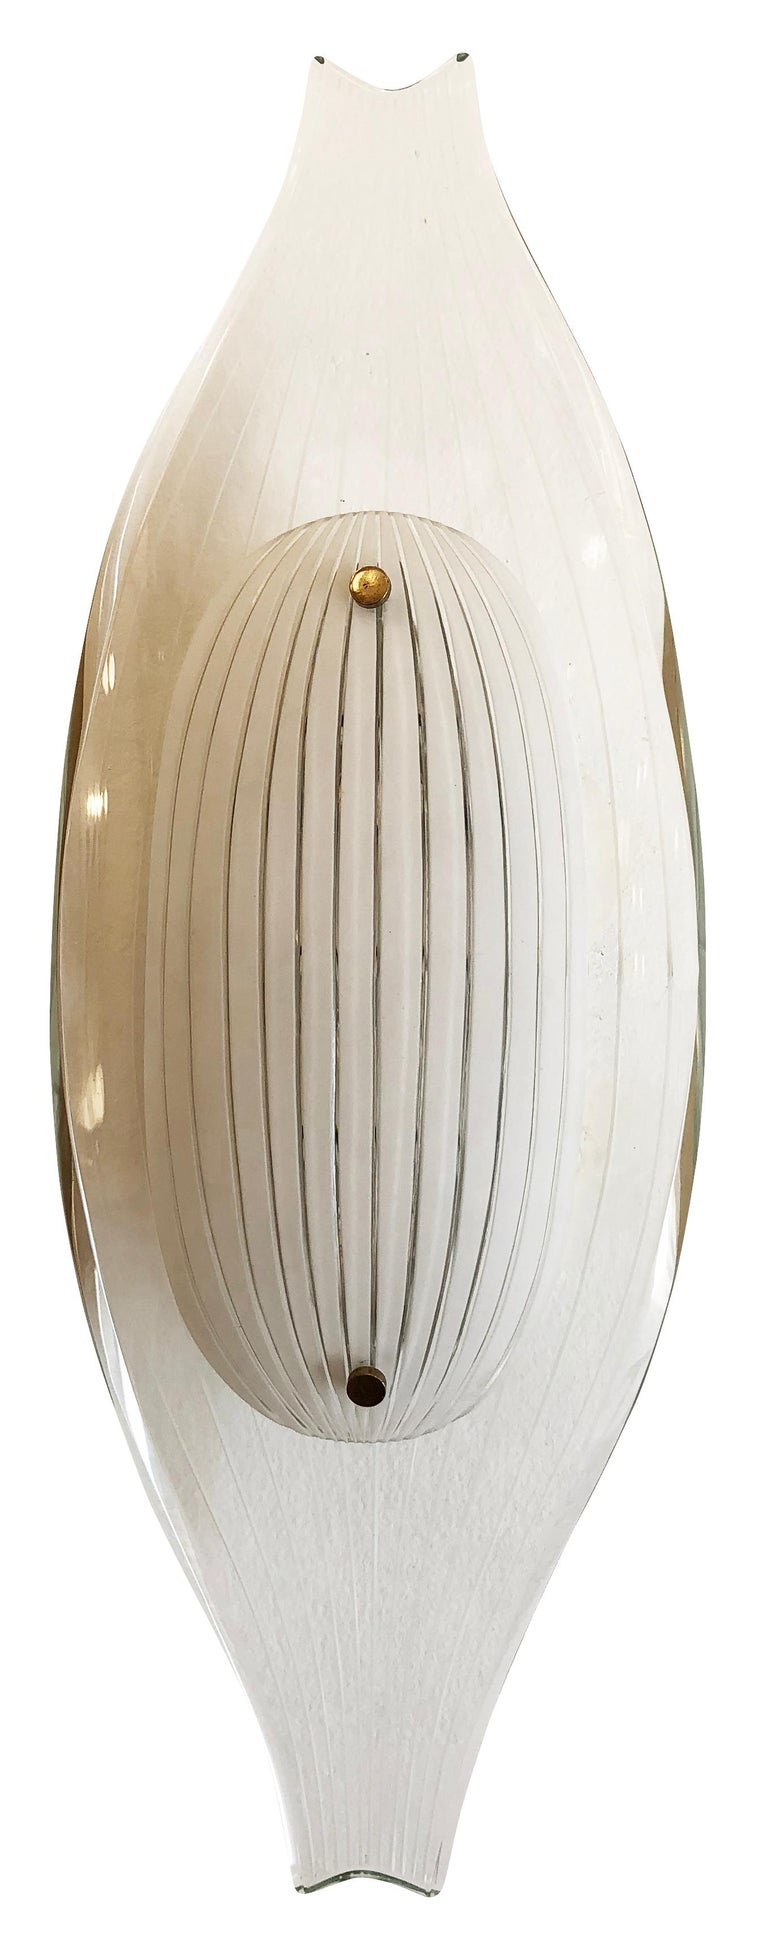 Mid-Century Modern Fontana Arte Flush Mount Model 2340 by Max Ingrand For Sale